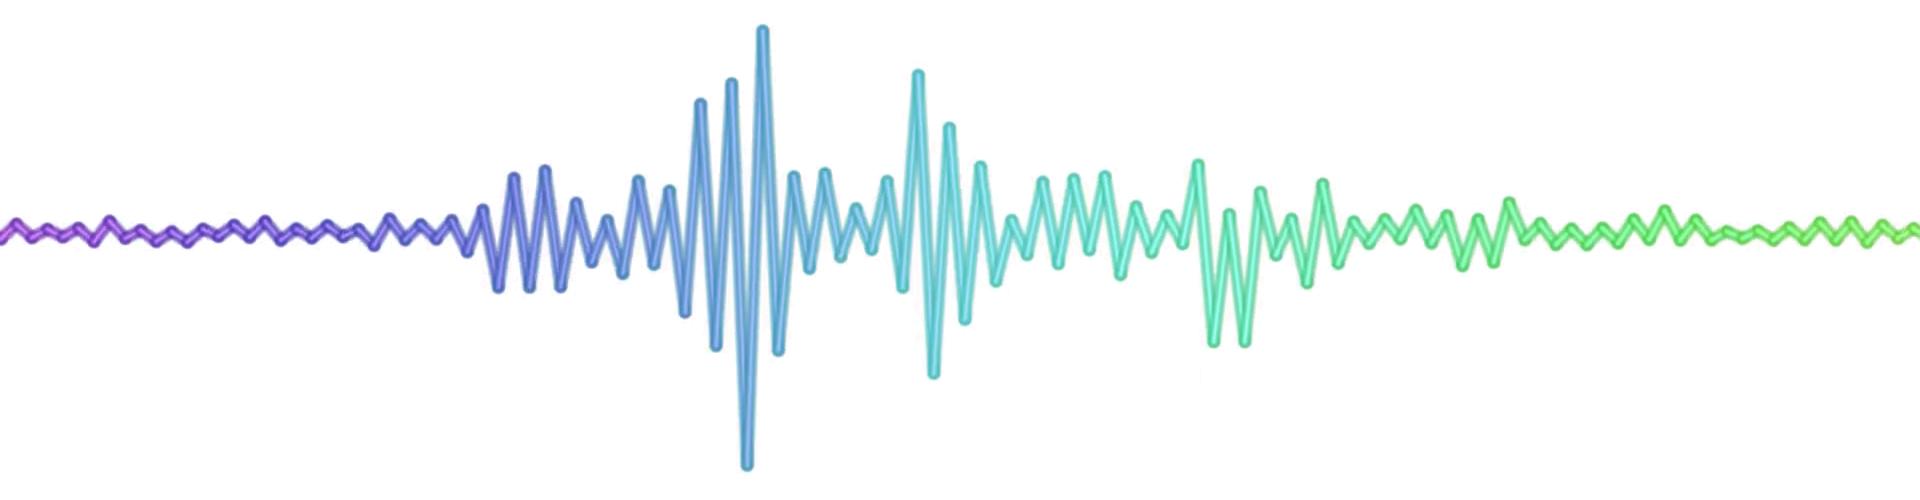 635261844-sound-waves_right.jpg